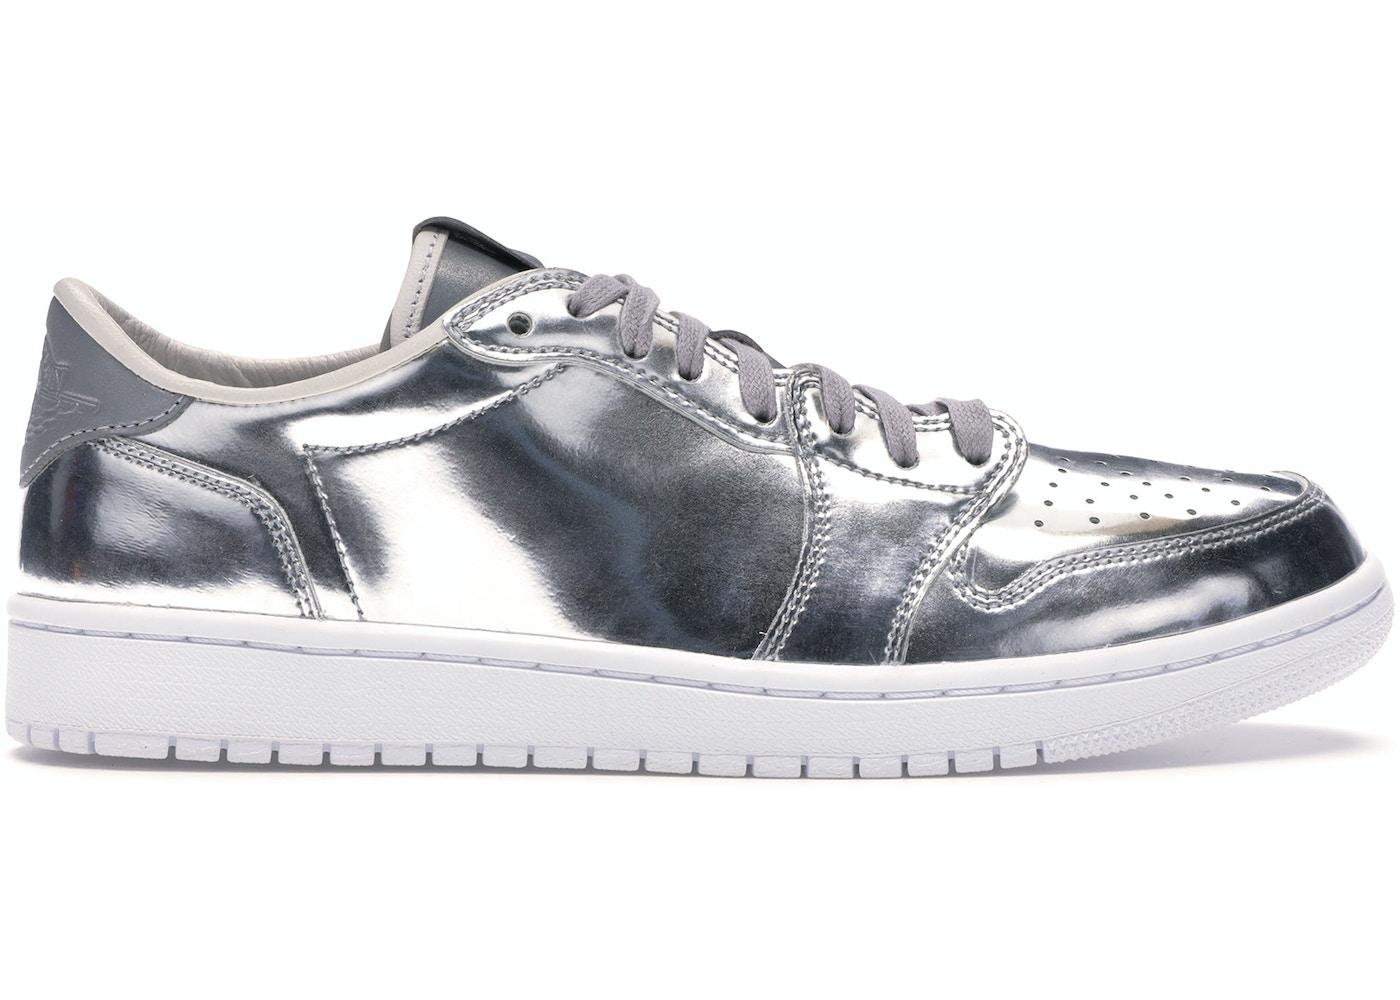 13eb60226e5 Jordan 1 Retro Low Pinnacle Metallic Silver - 852549-003